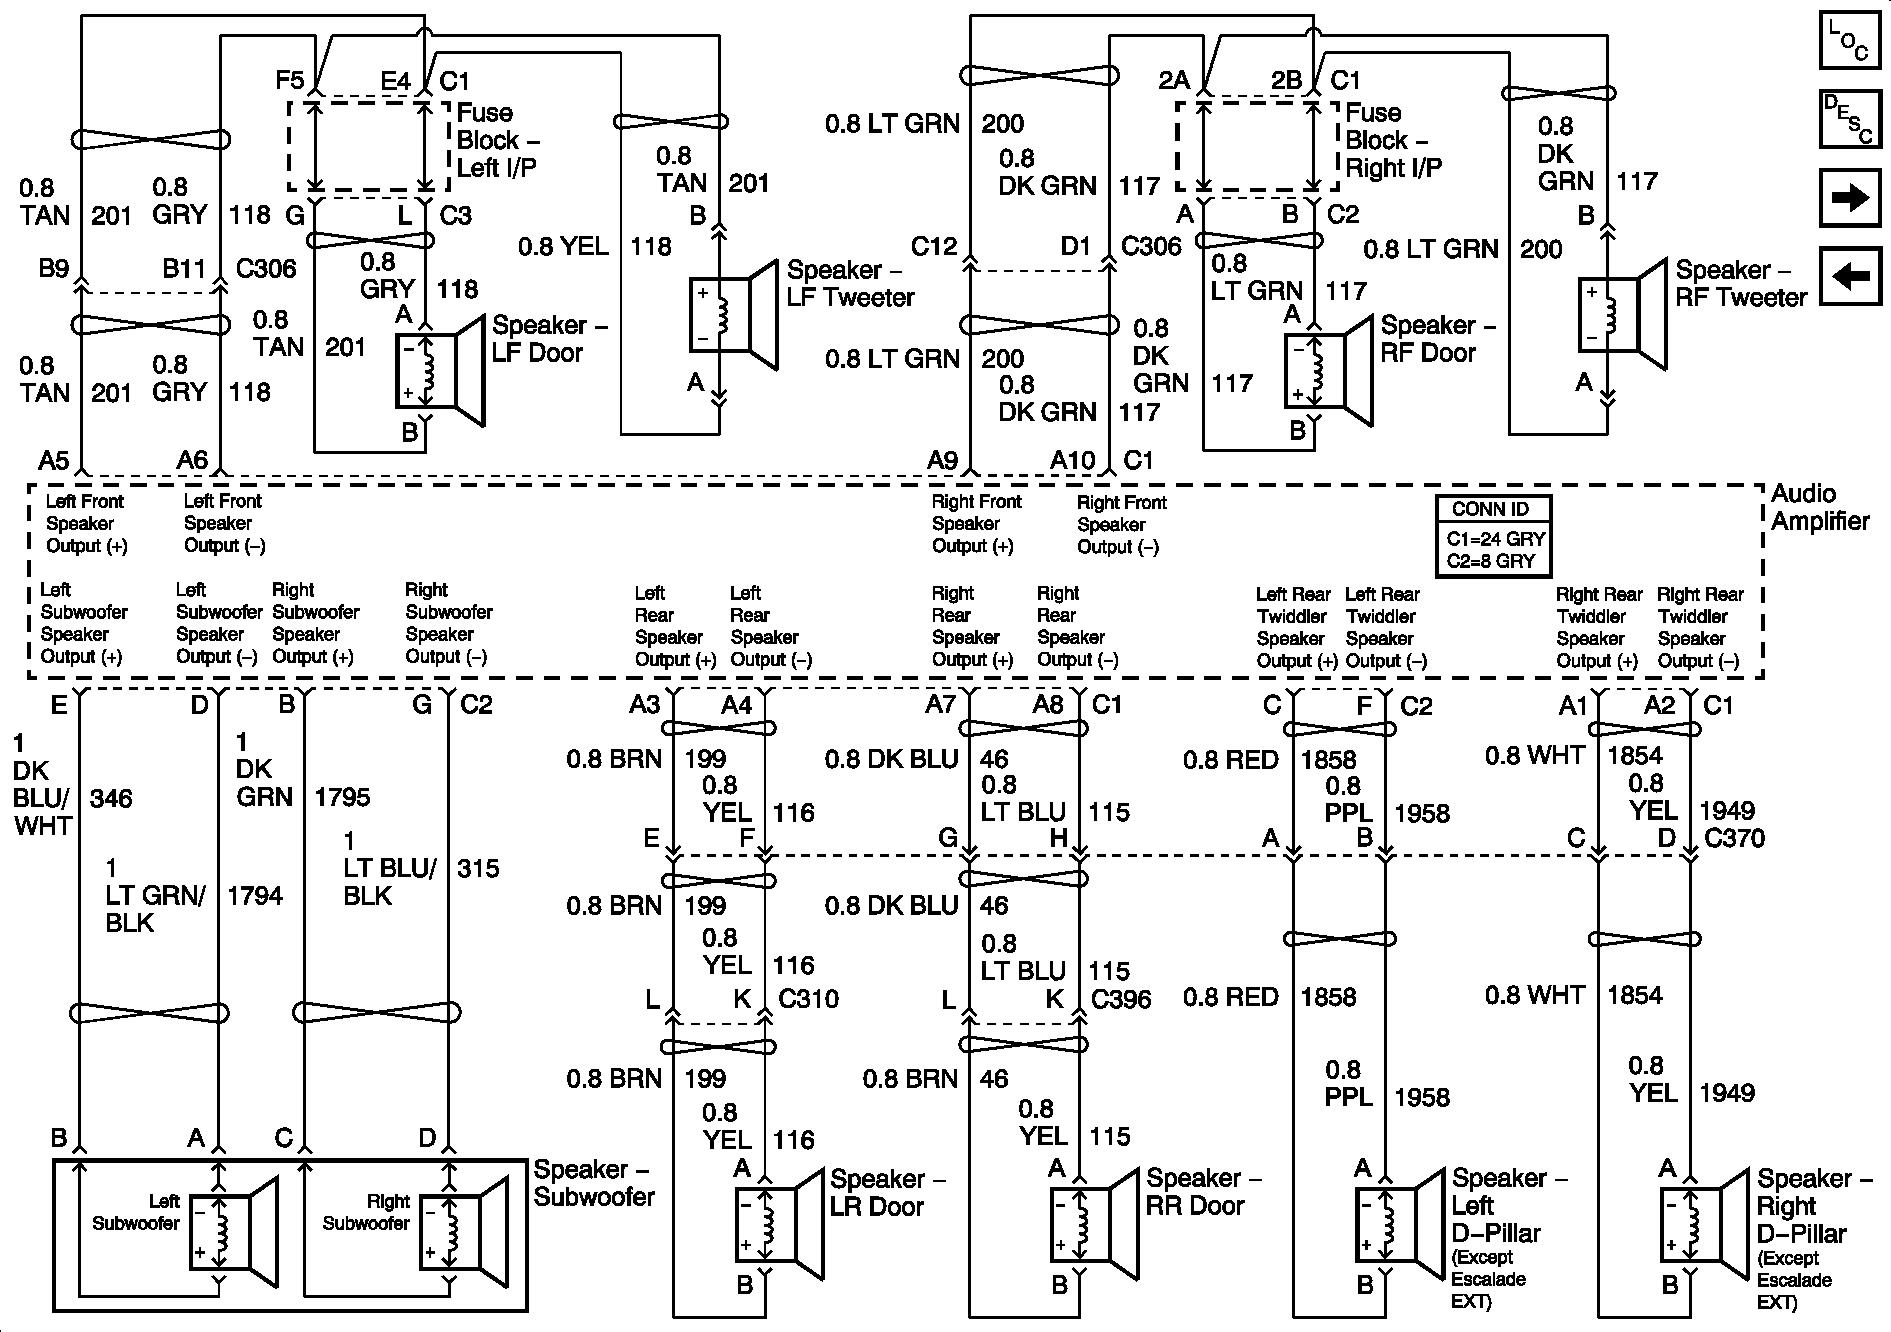 96 cadillac wiring diagram